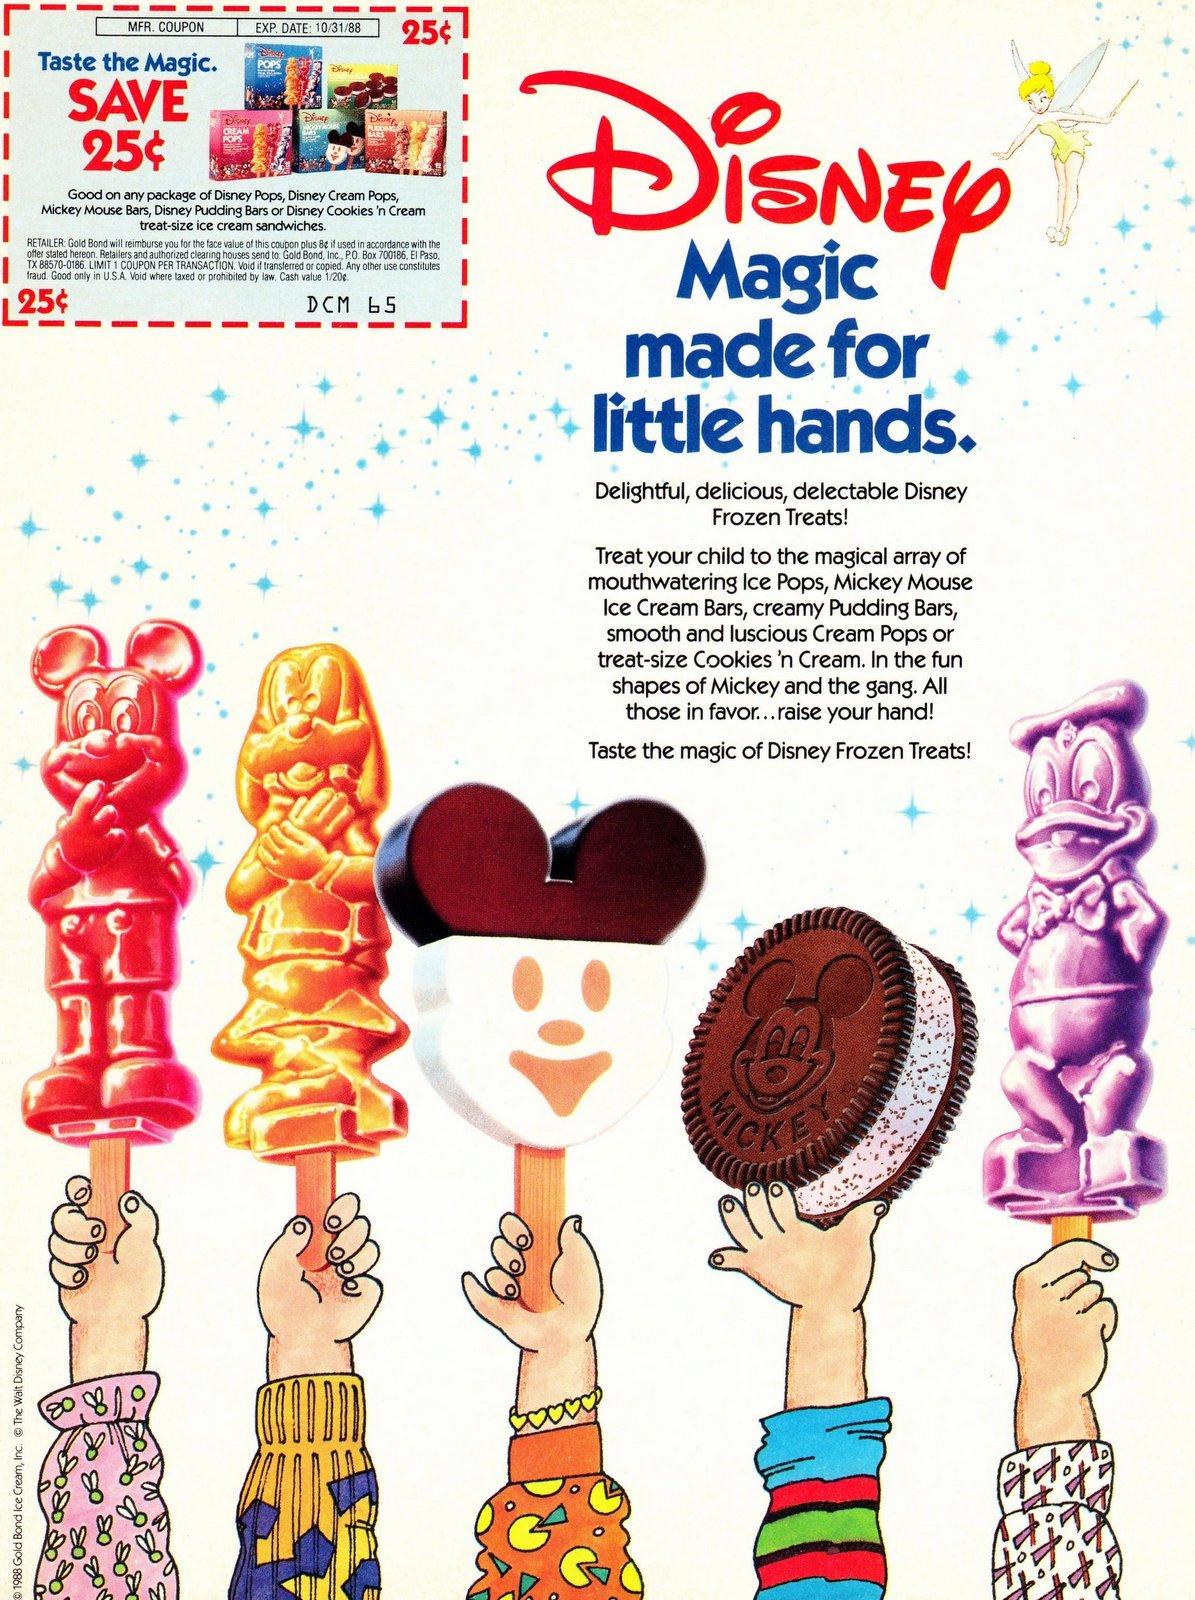 Disney frozen treats - pops (1988)